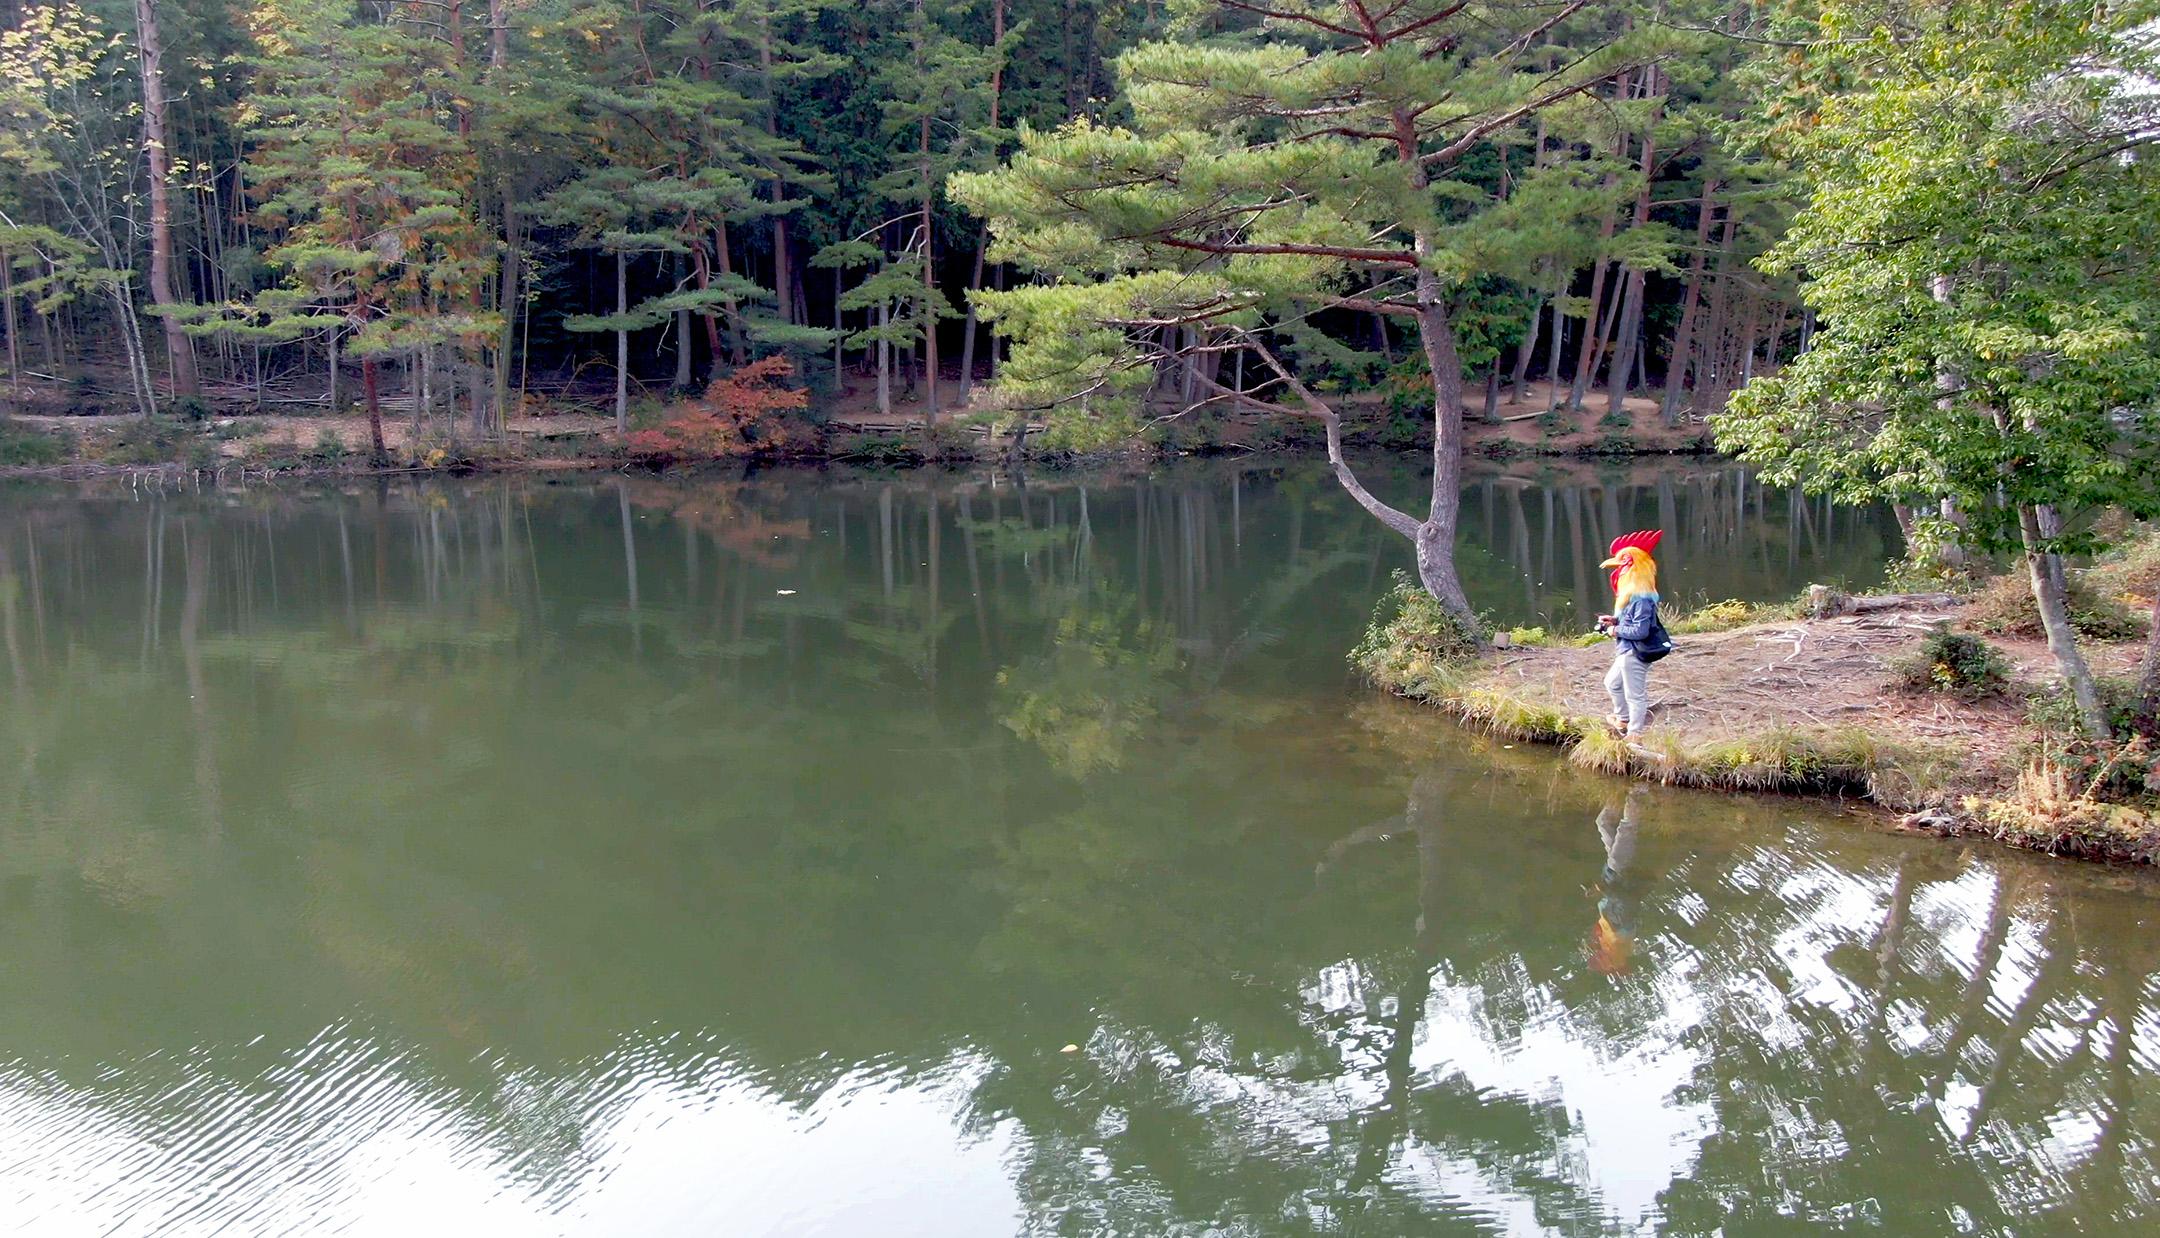 RGM SCENE.07 釣りとキャンプ おおぐて湖キャンプ場 [長野県]